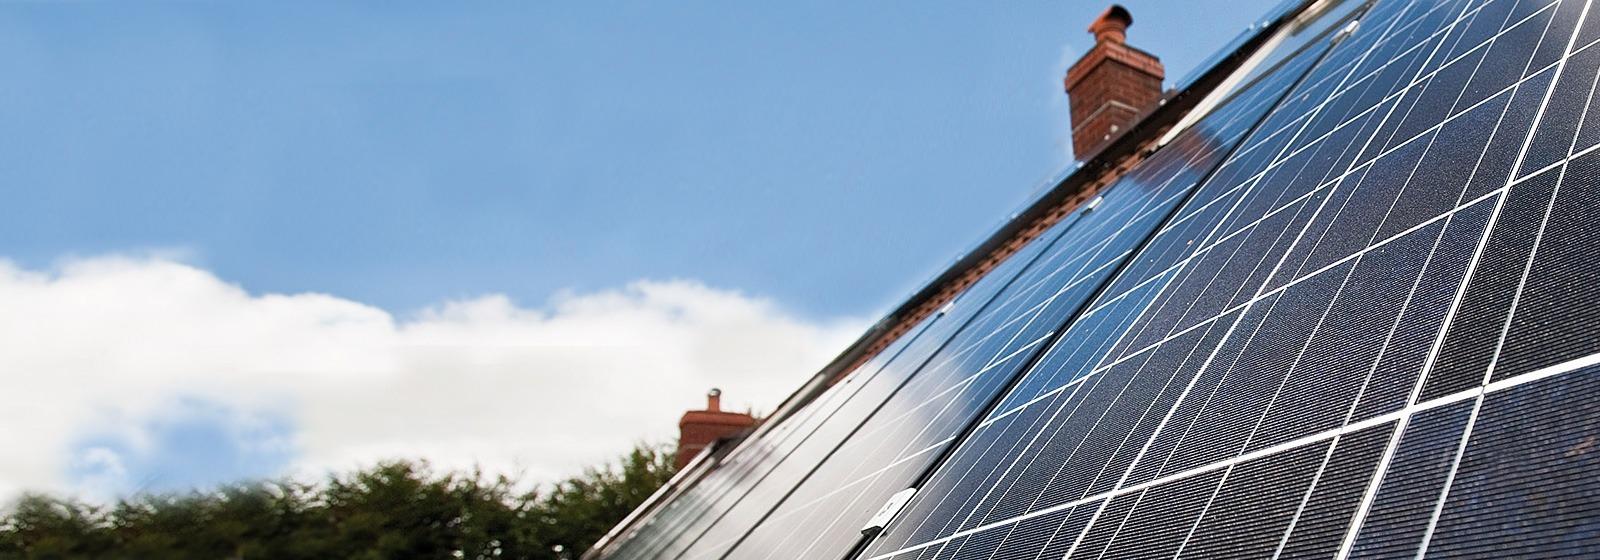 Solar photovaltaics (PV)